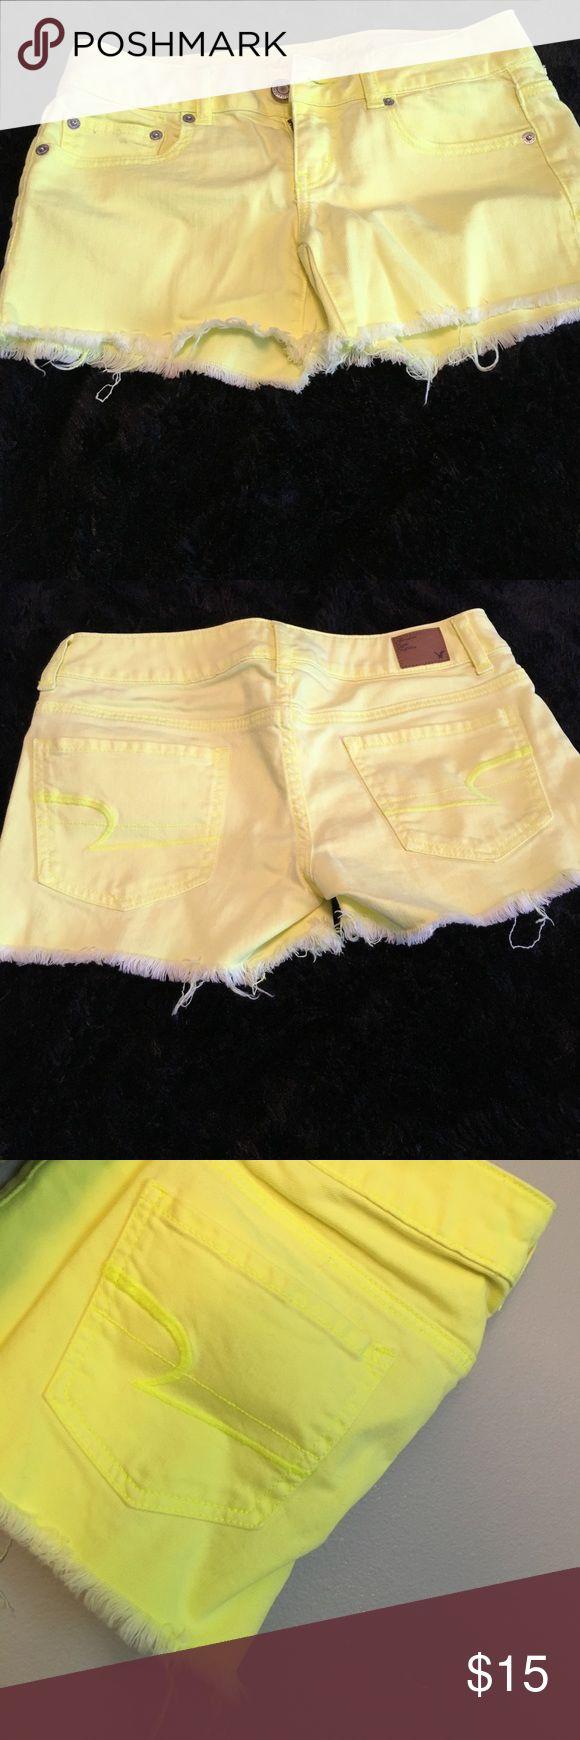 American Eagle neon yellow shorts American Eagle neon yellow shorts. Size 2 American Eagle Outfitters Shorts Jean Shorts